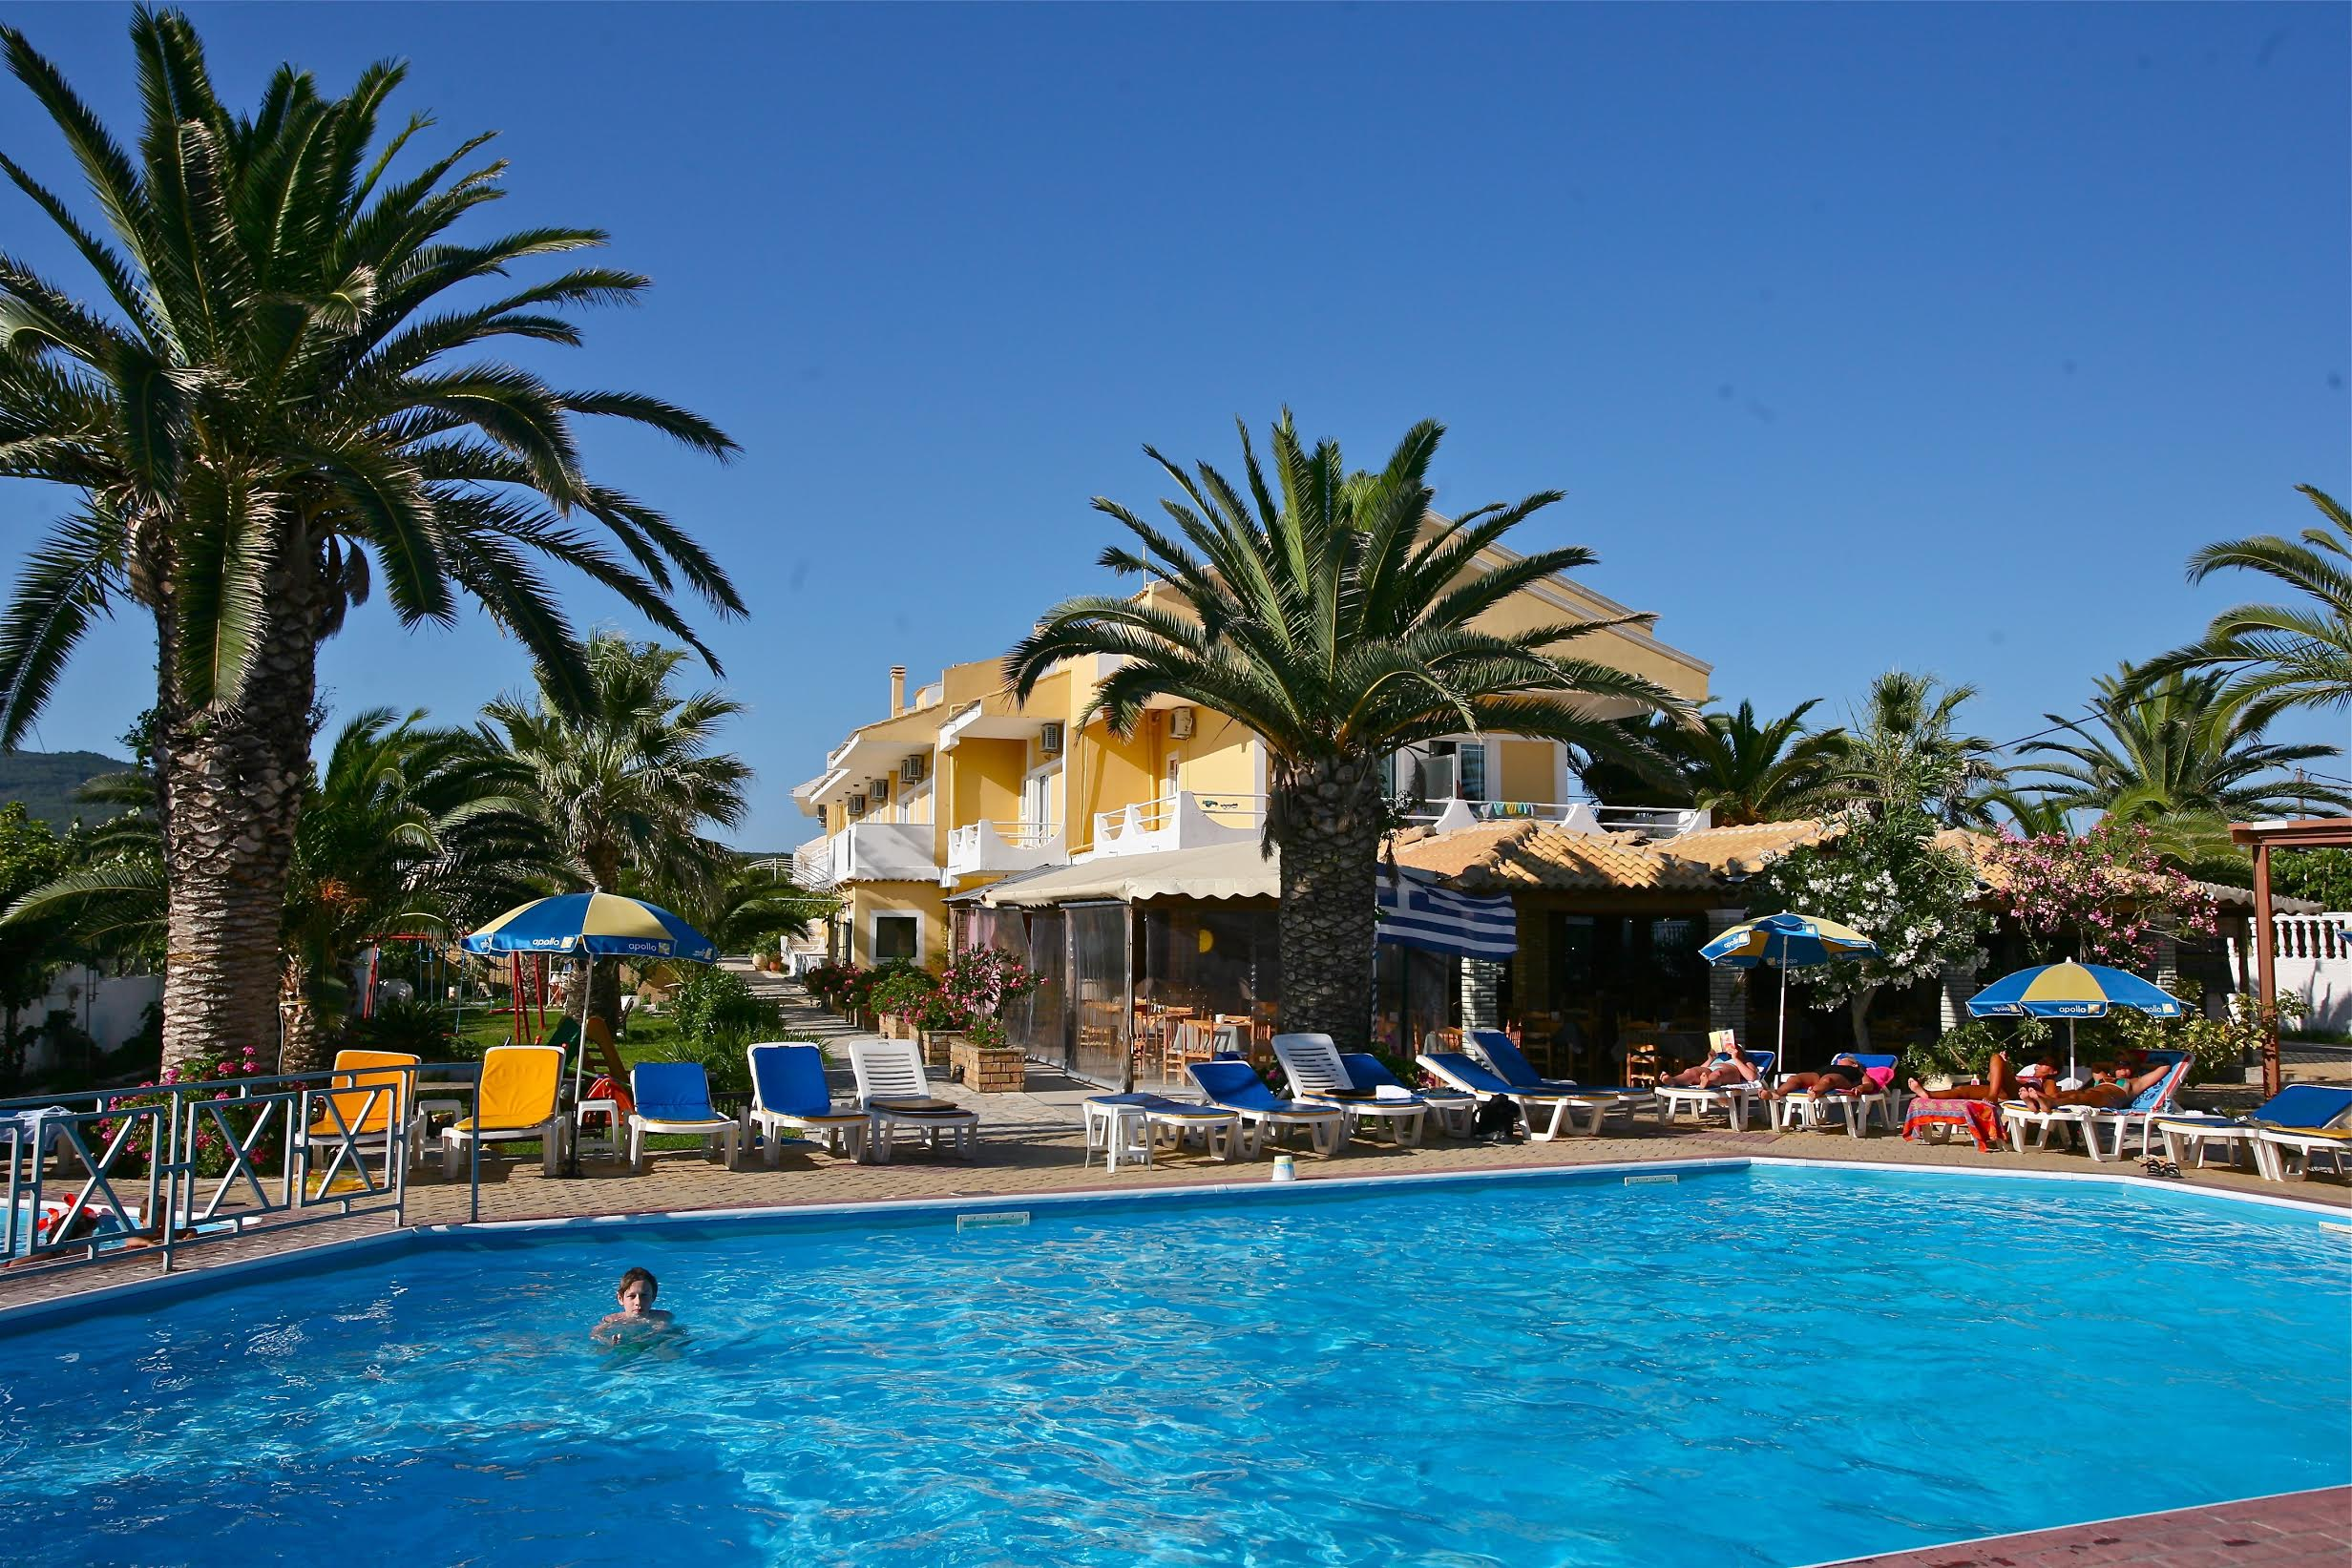 20070625 Korfu Barn som bader i basseng i syden